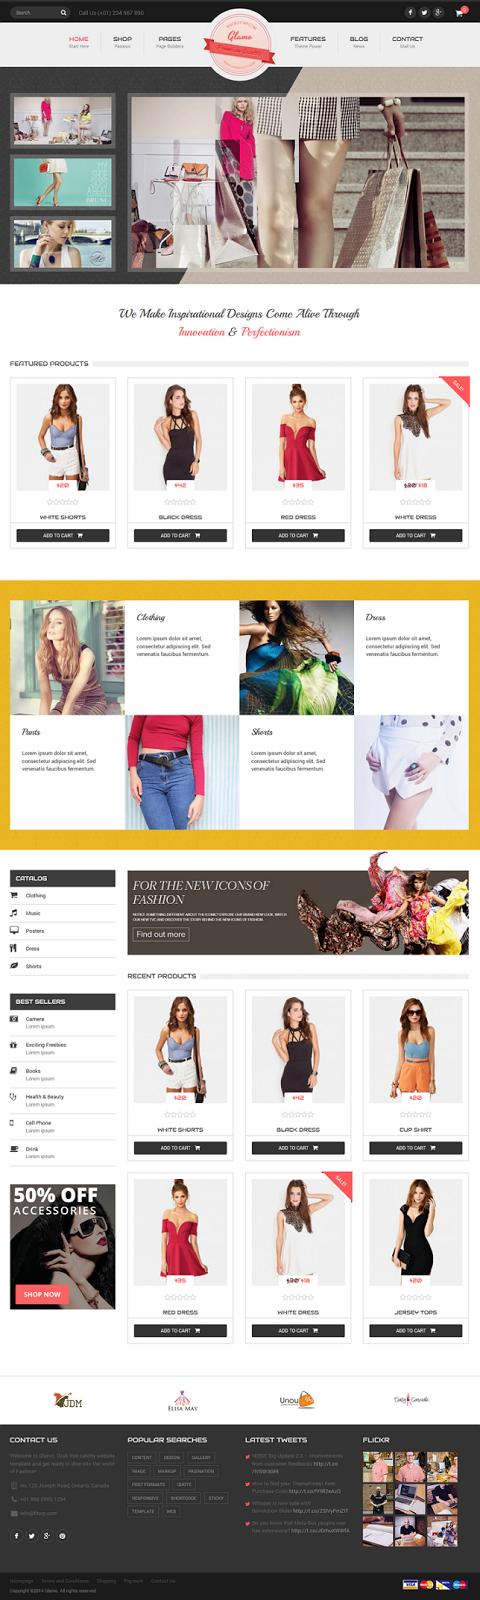 Free Responsive WordPress eCommerce Theme